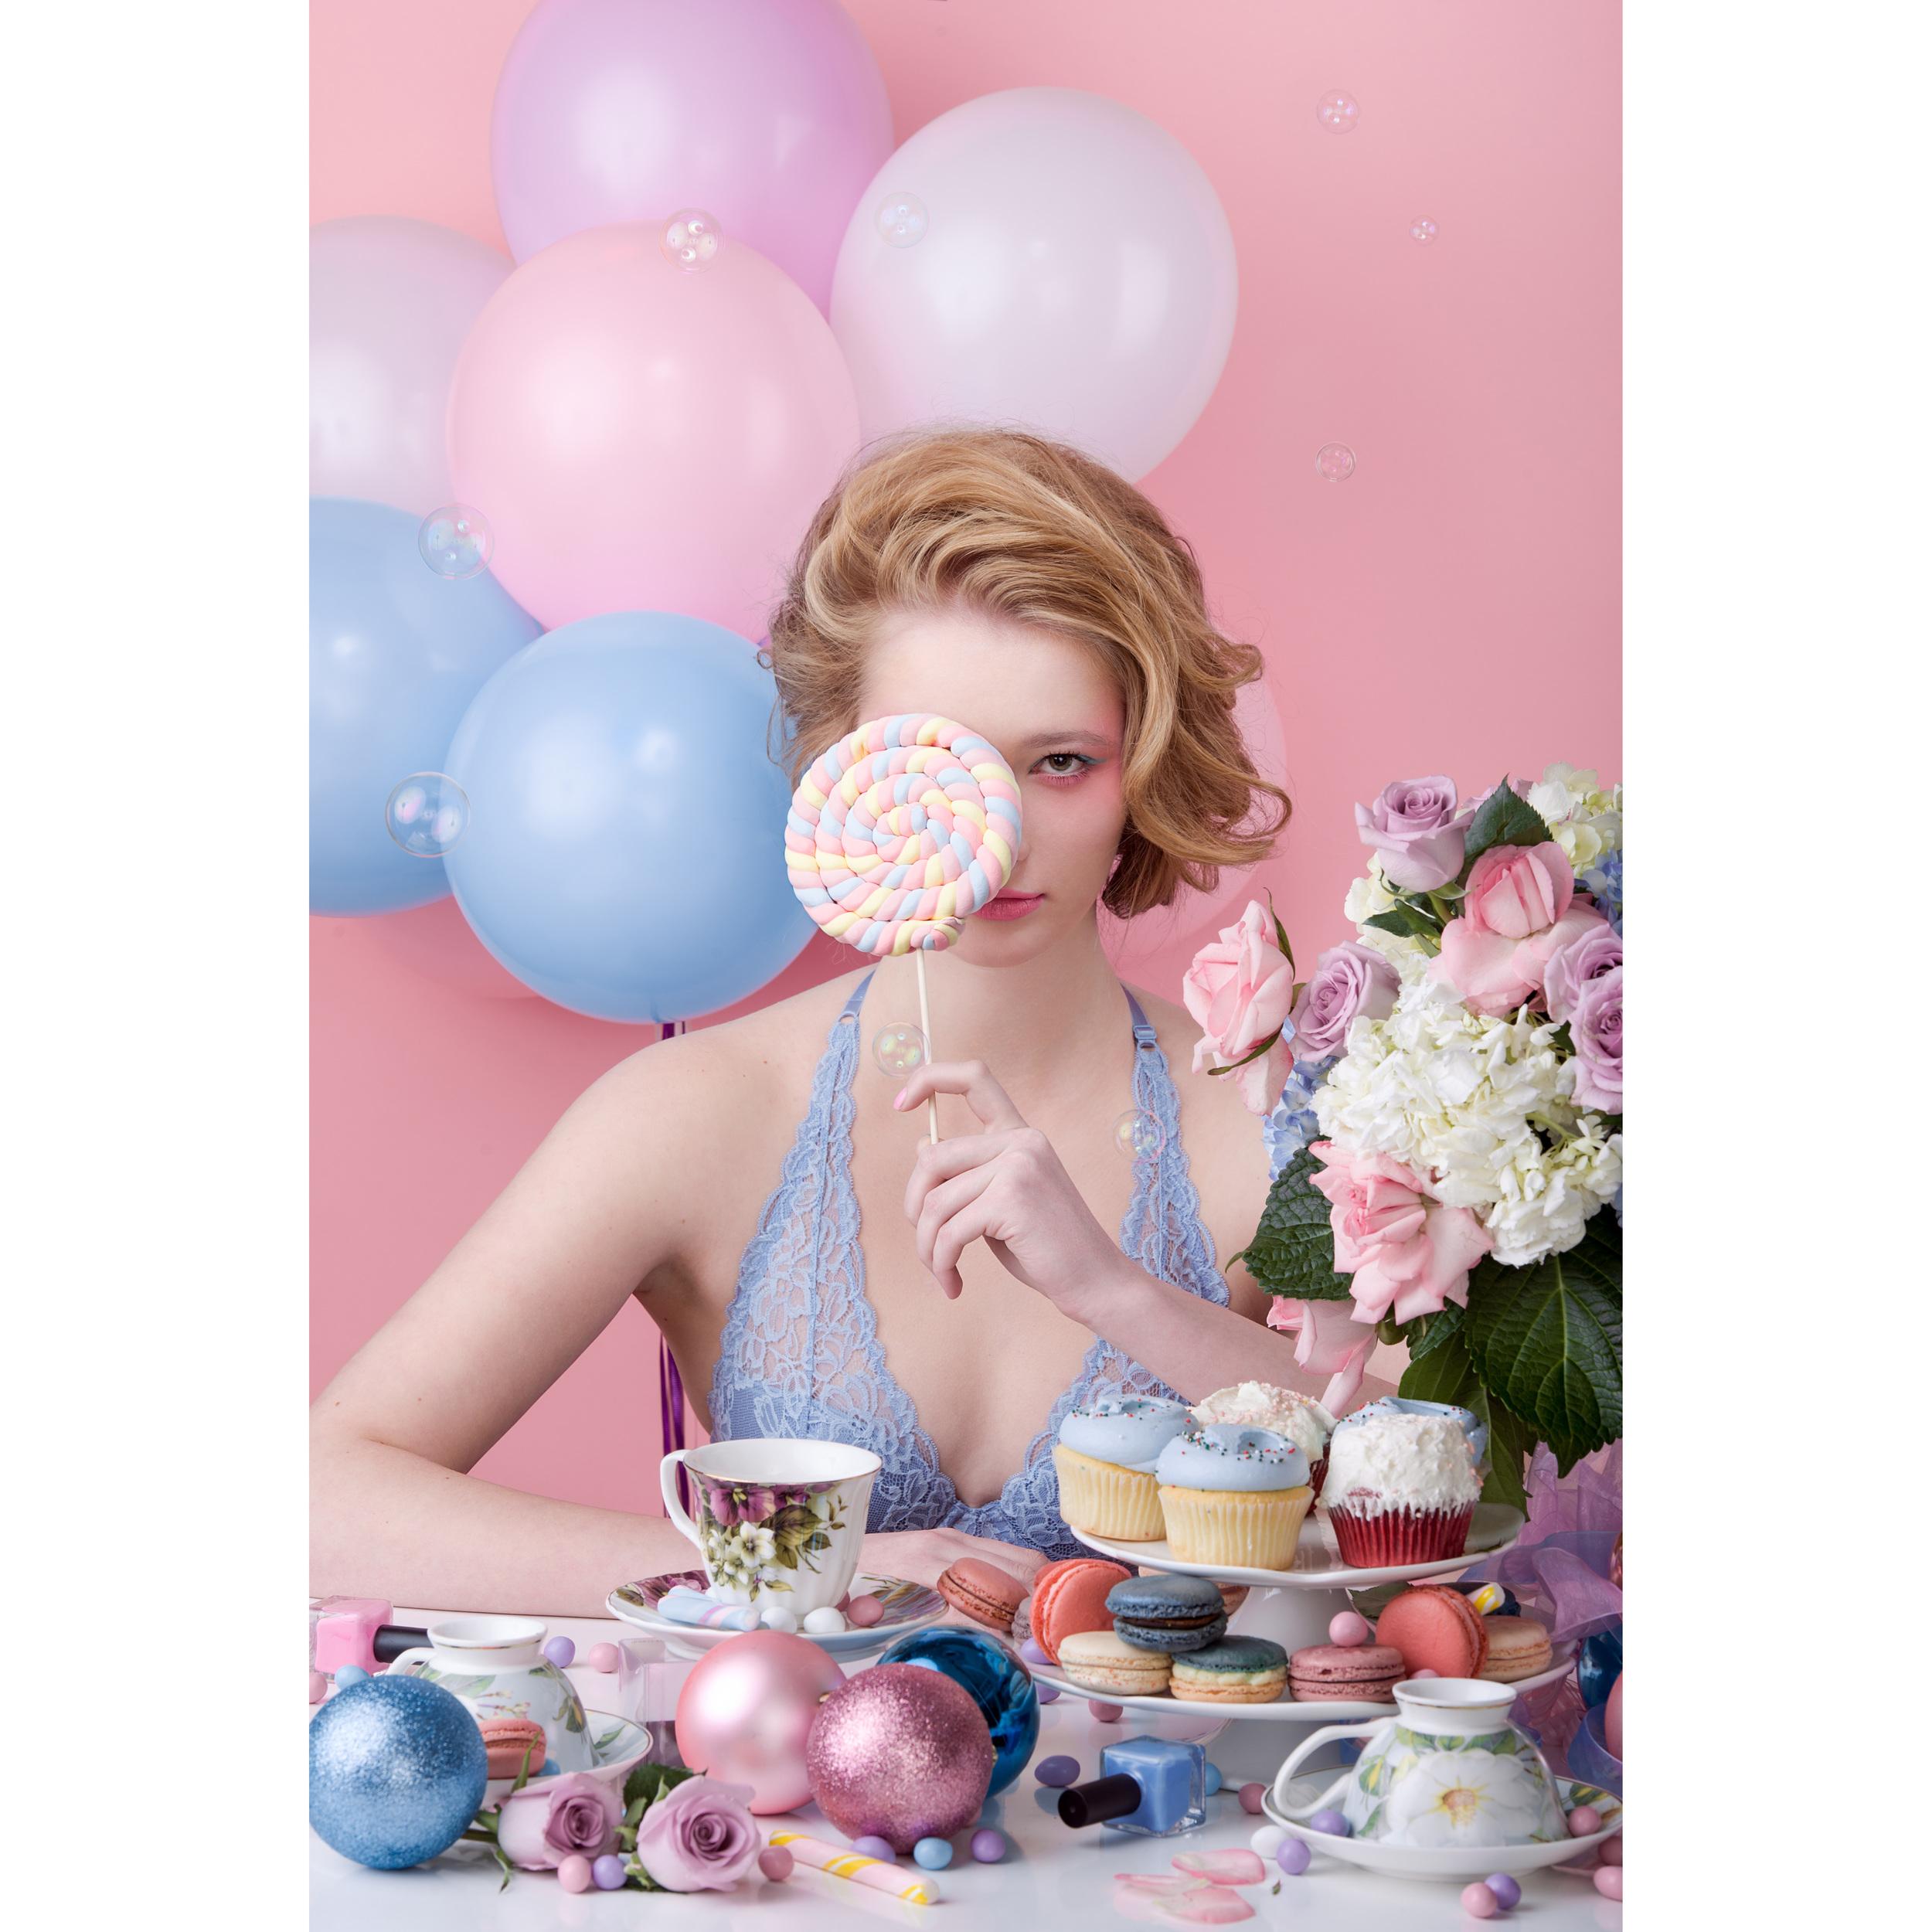 Candy Dream-C151220 Maria-2553-Edit copy.jpg